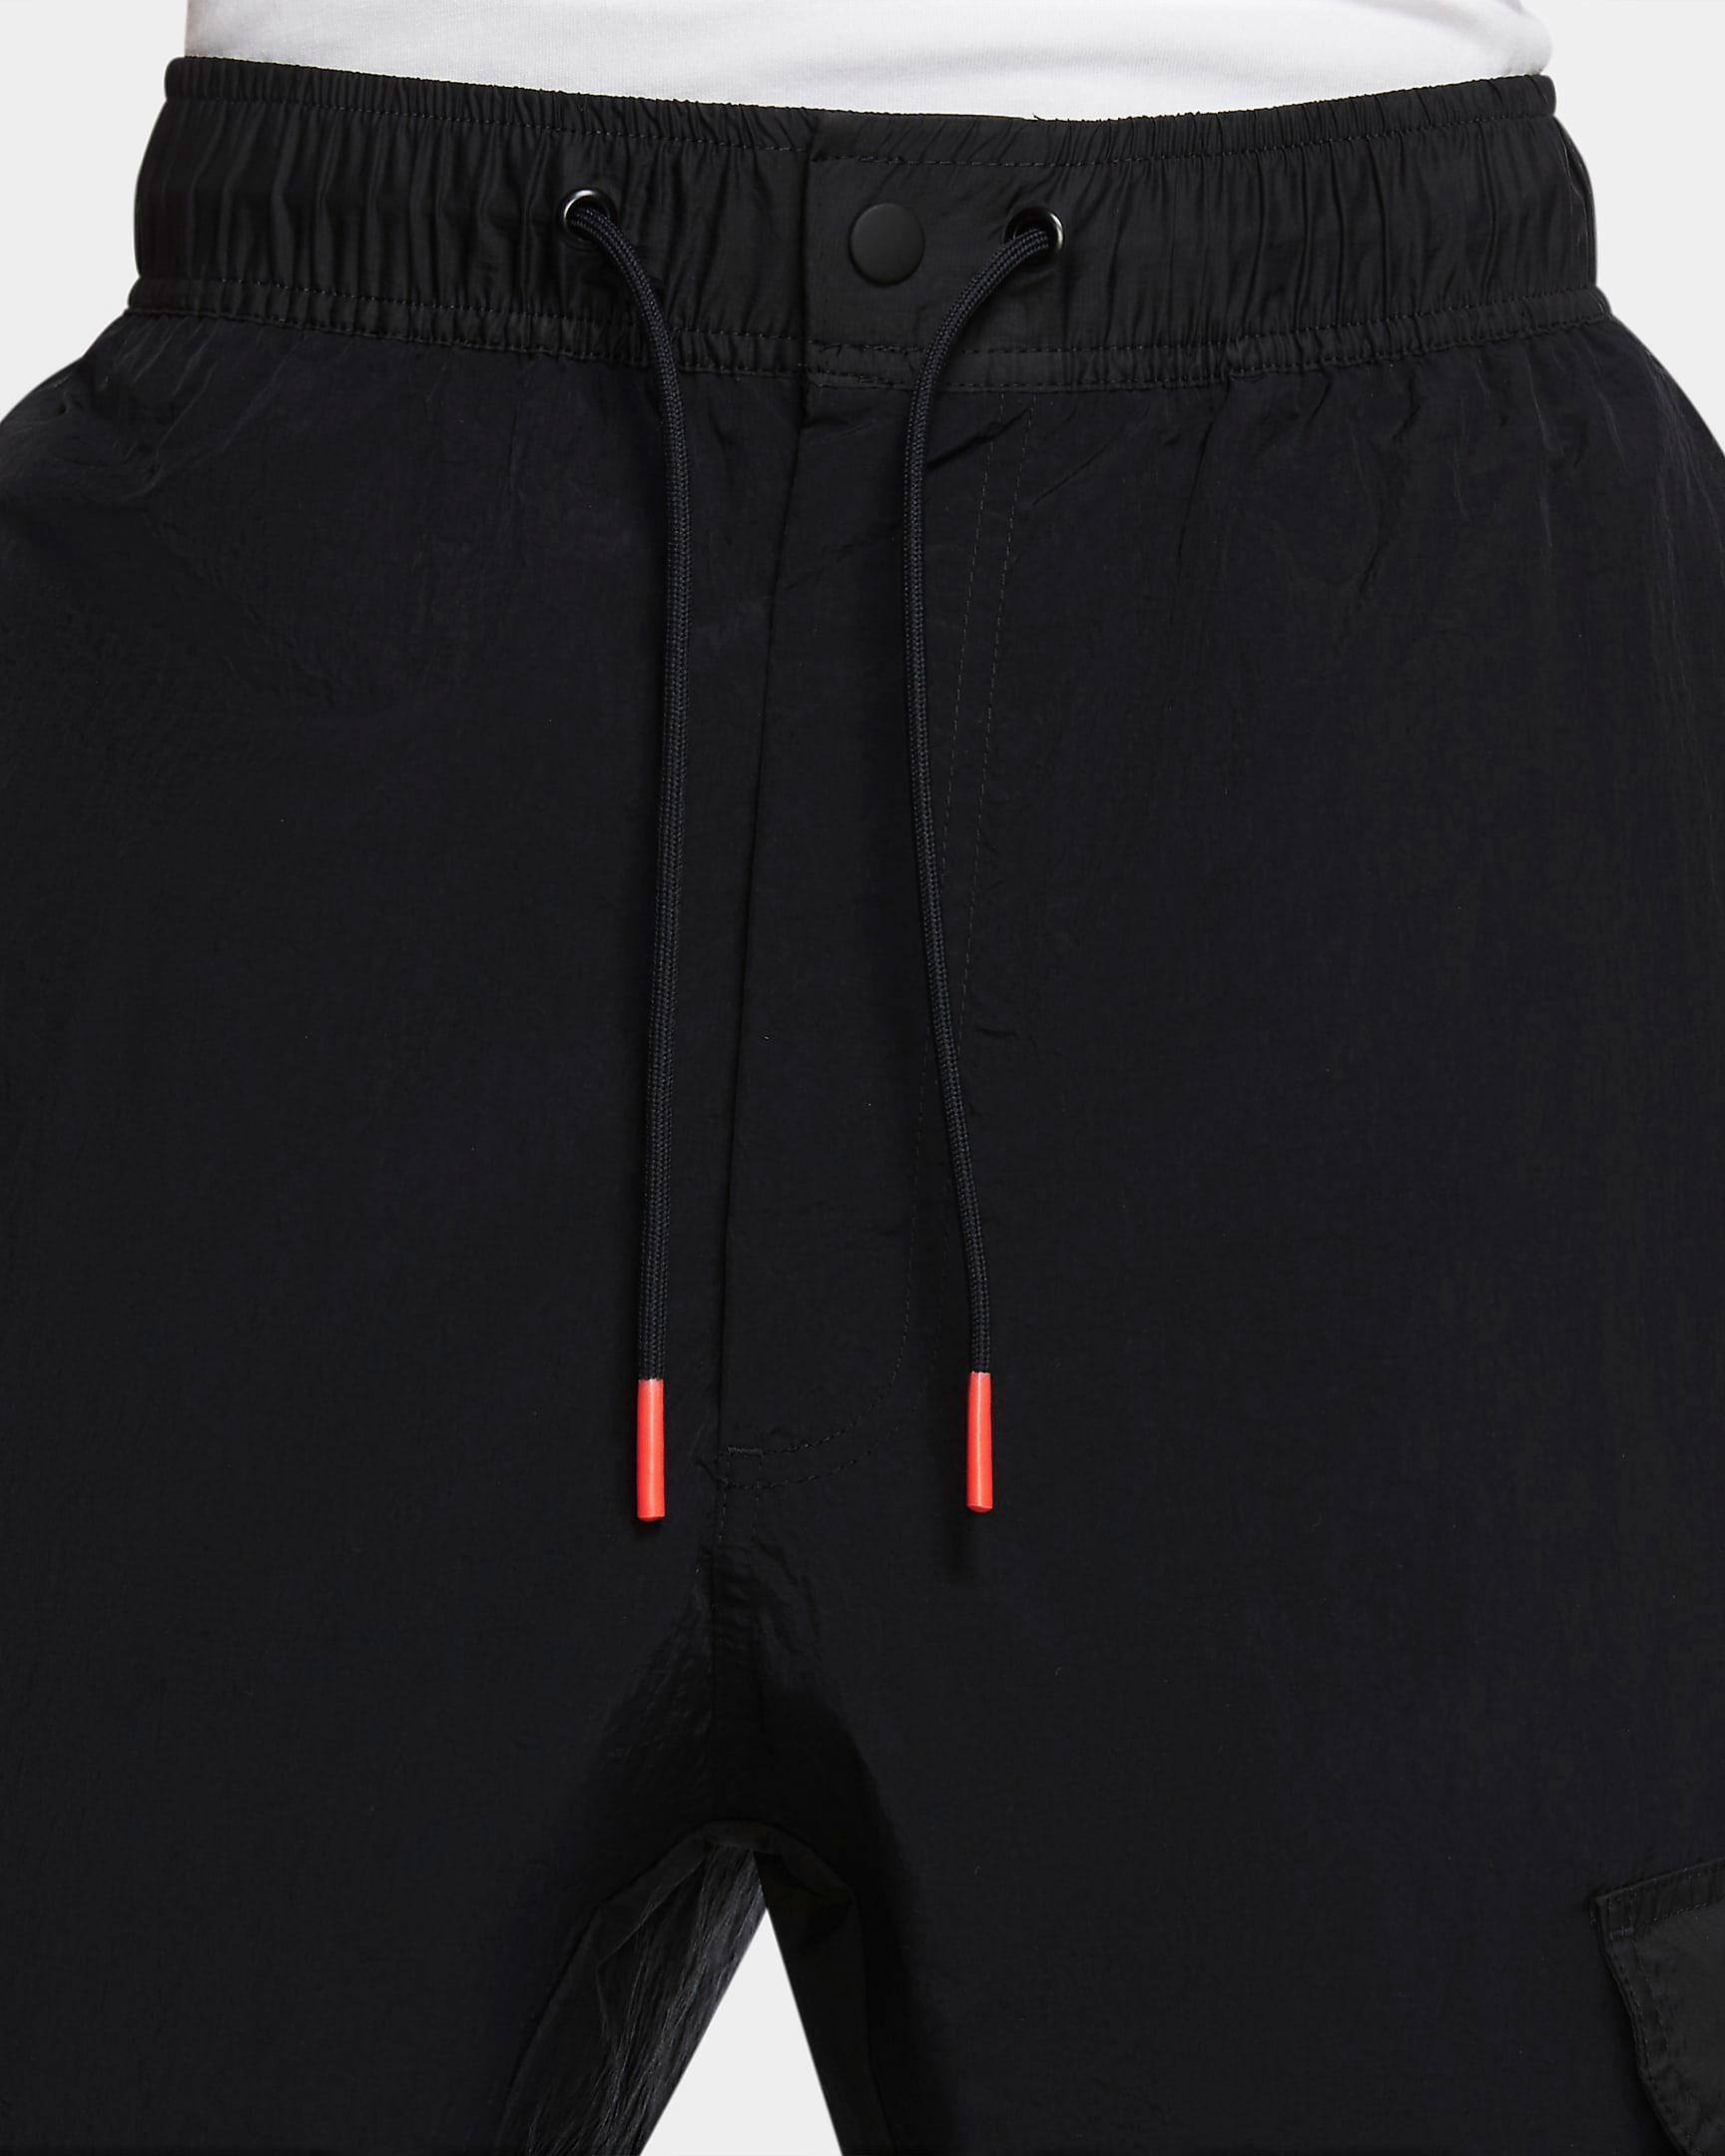 air-jordan-11-adapt-cargo-pants-match-2